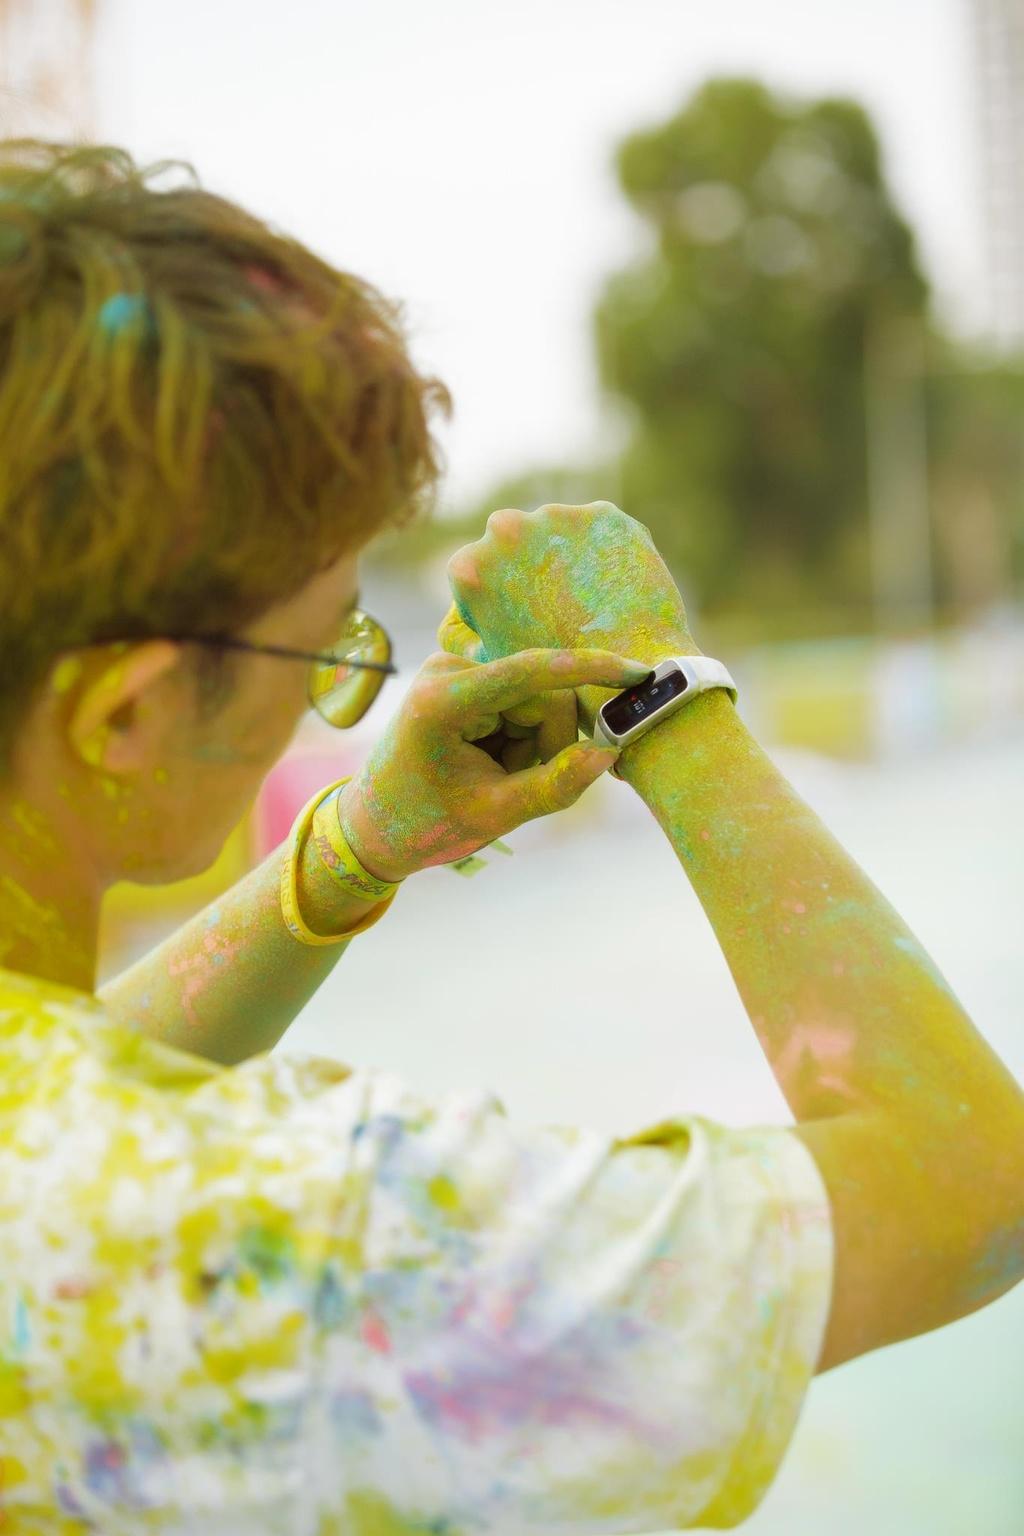 Duong chay Color Me Run day mau sac nhung day moi la dieu noi bat nhat hinh anh 21